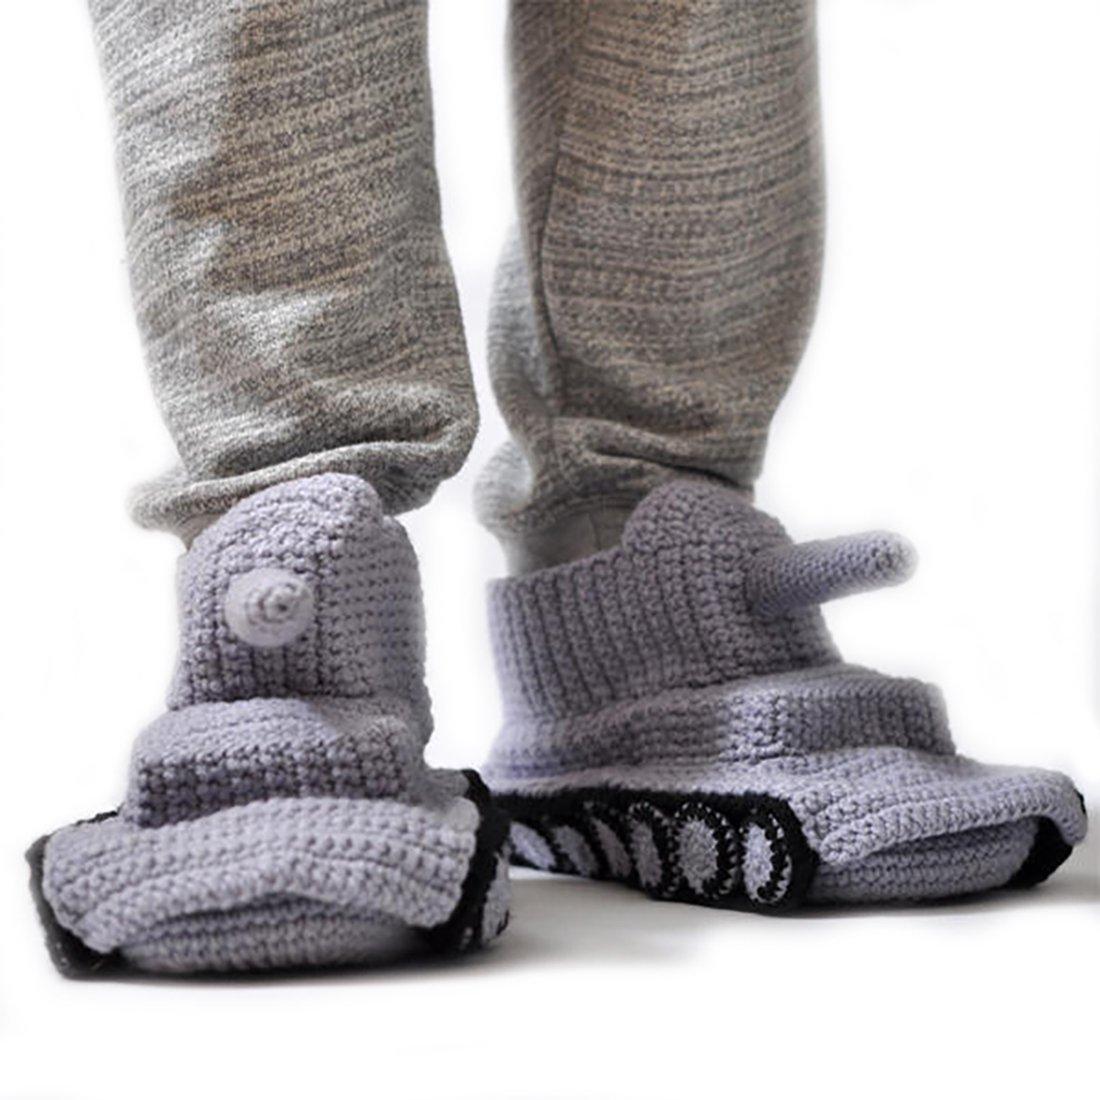 Amazon.com: Handmade Crochet Grey Tank Slippers, handknitted ...